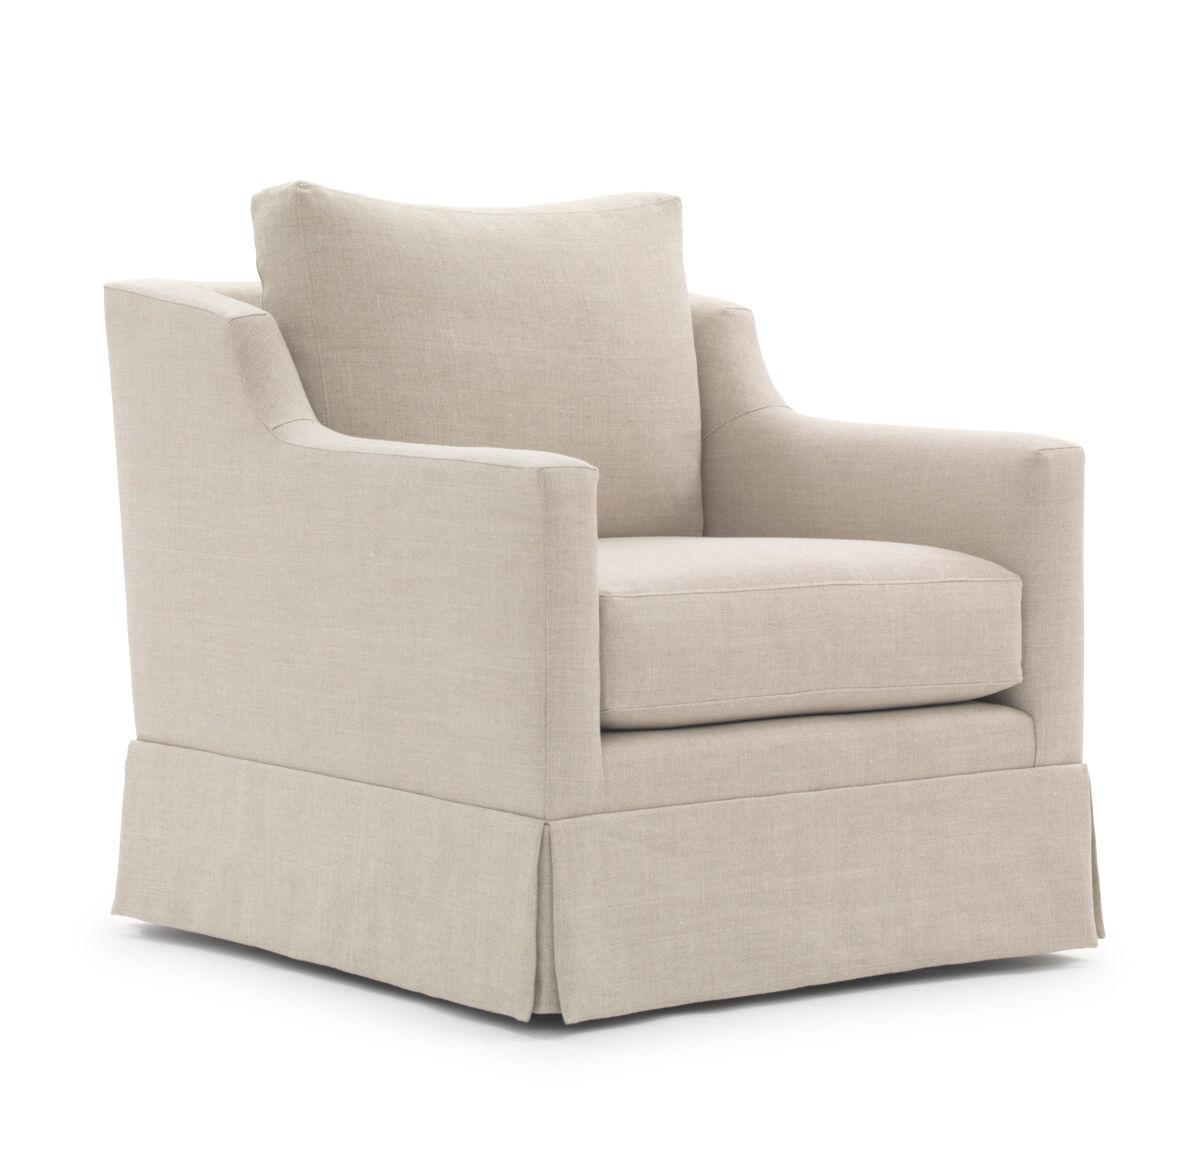 swivel chair keeps turning nice folding chairs gigi skirted return